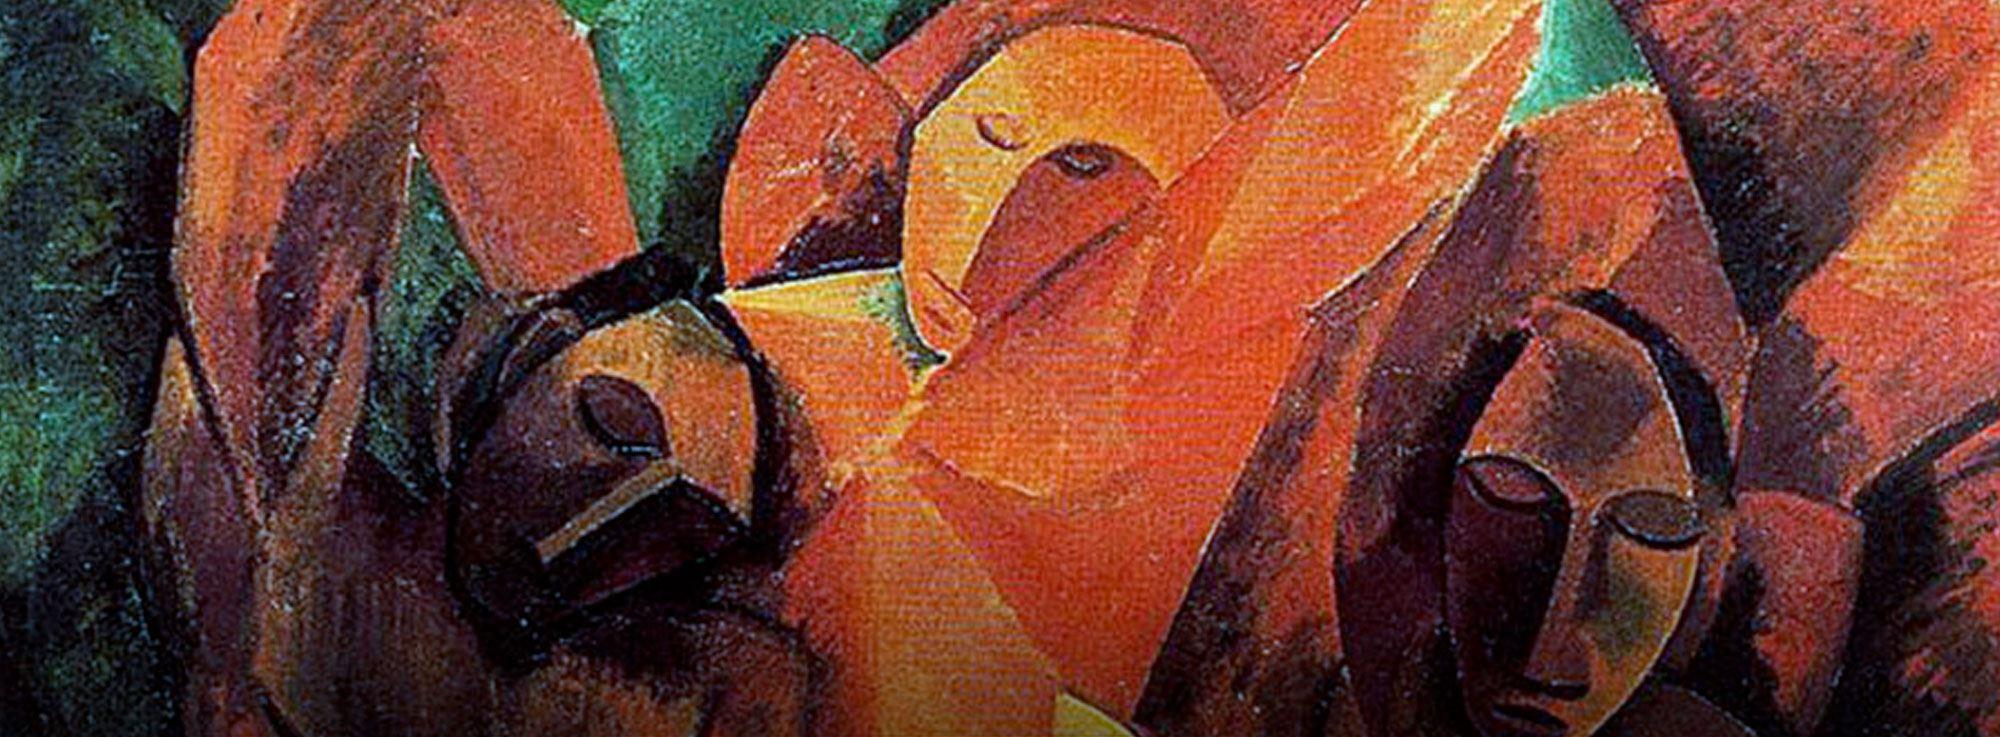 Martina Franca: Picasso. L'altra metà del cielo